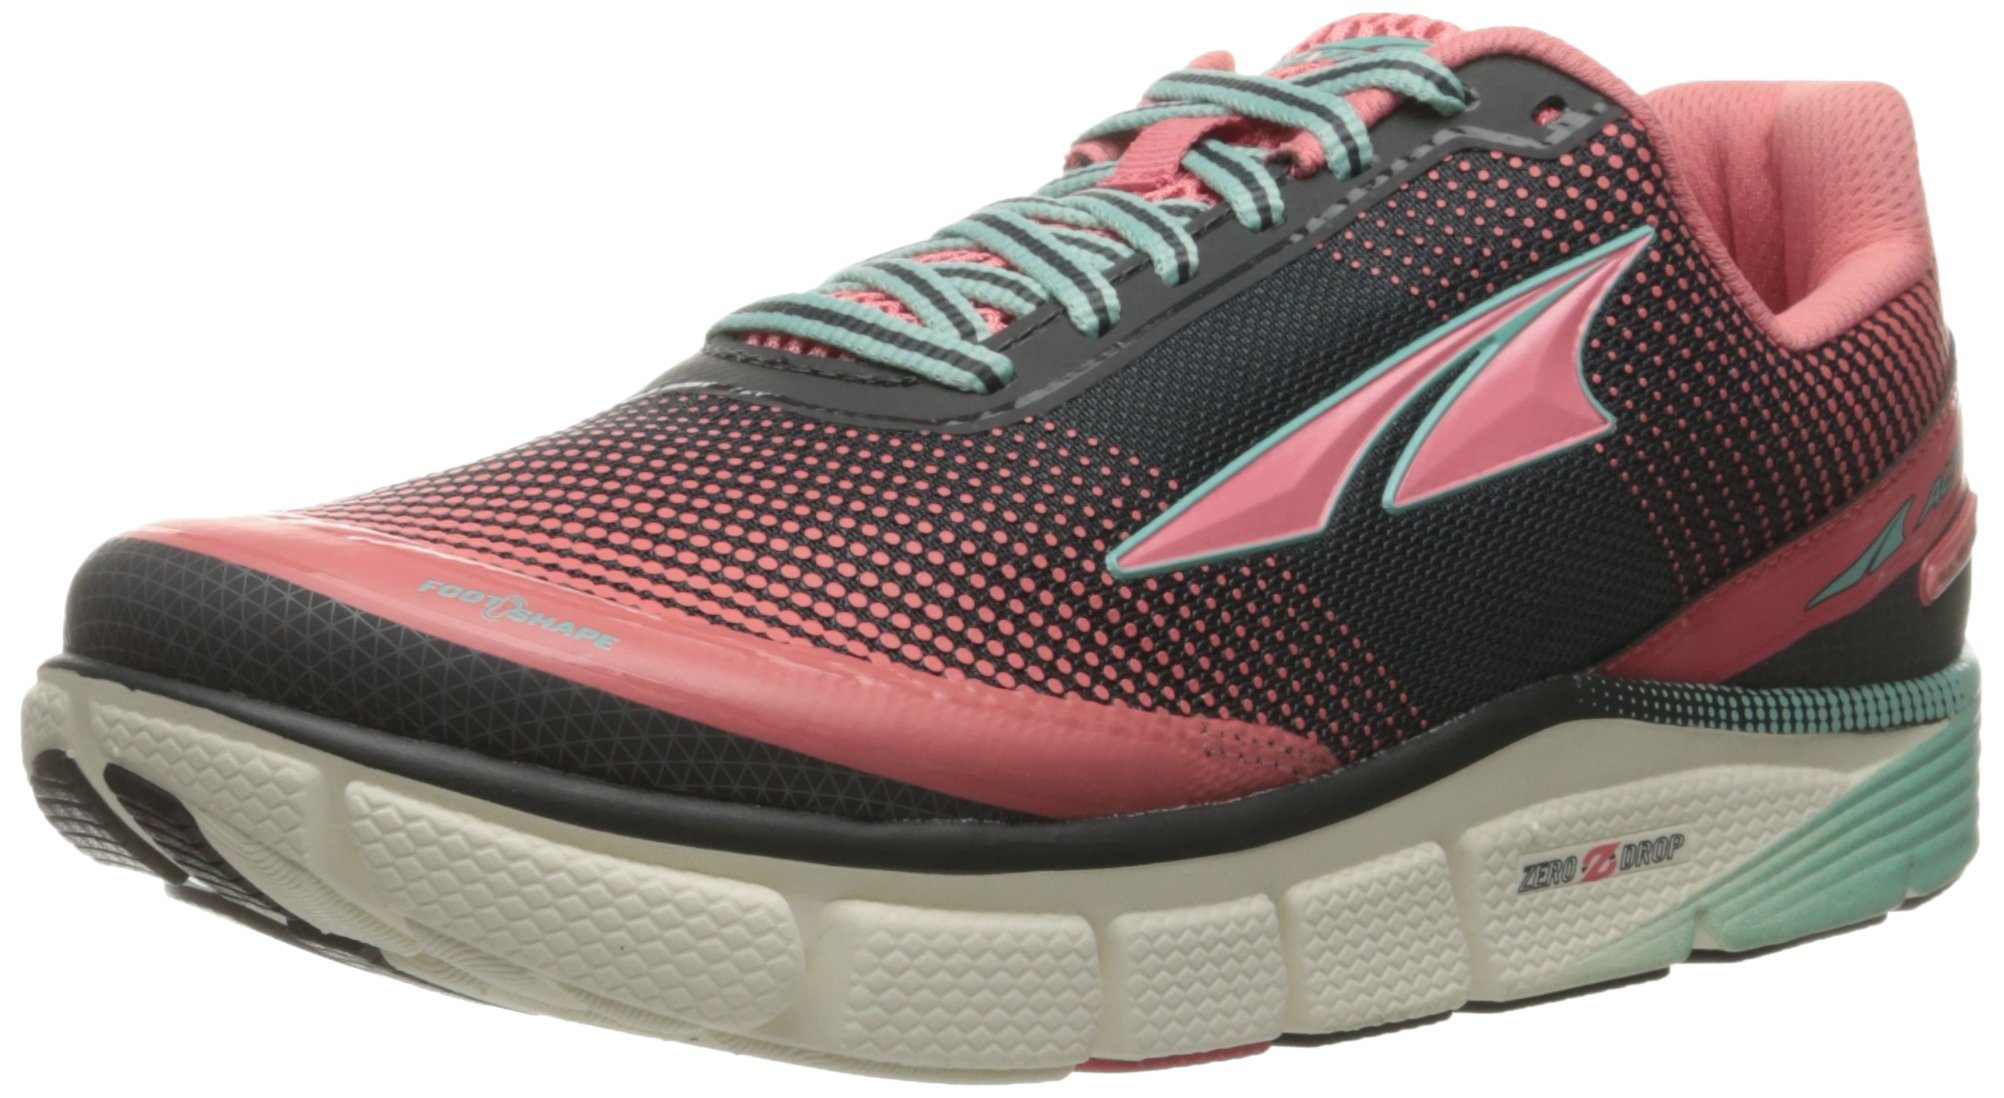 Altra Women's Torin 2.5 Trail Runner, Coral, 10.5 M US